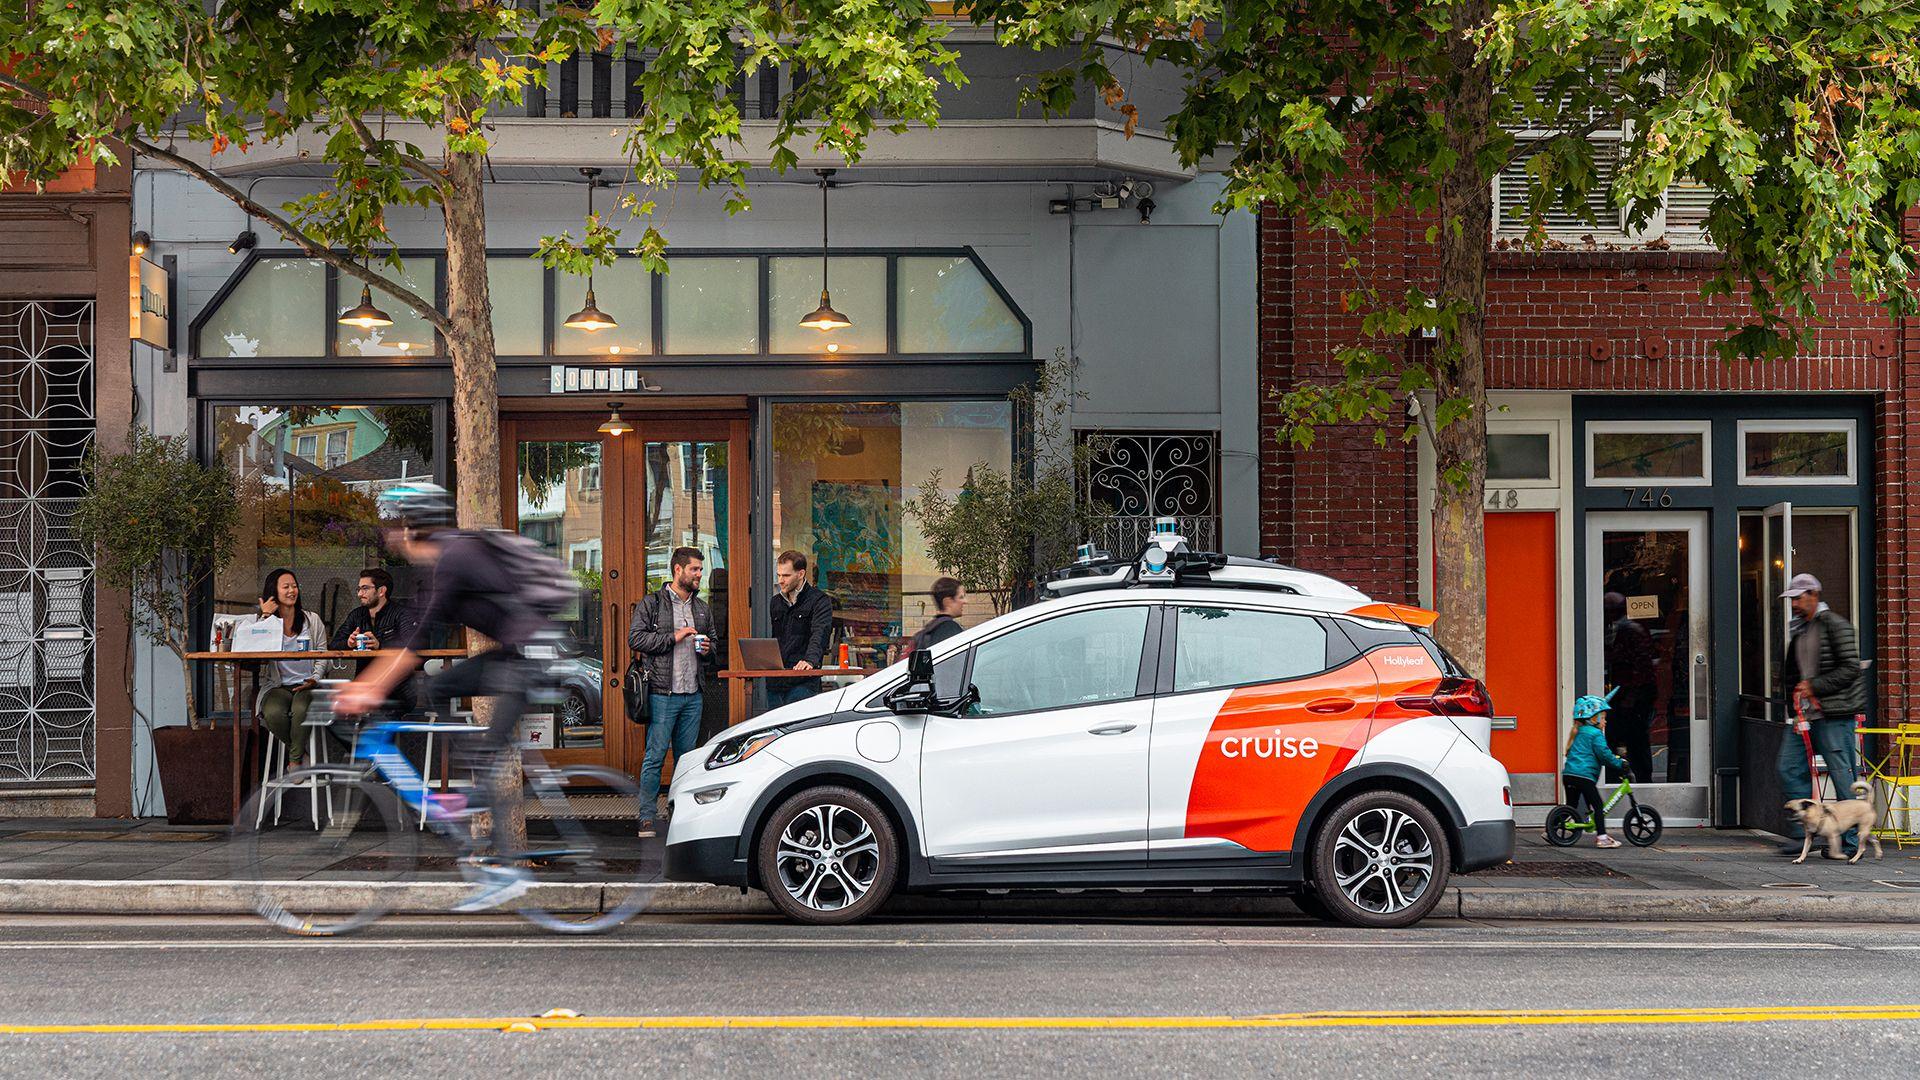 Cruise begins driverless testing in San Francisco